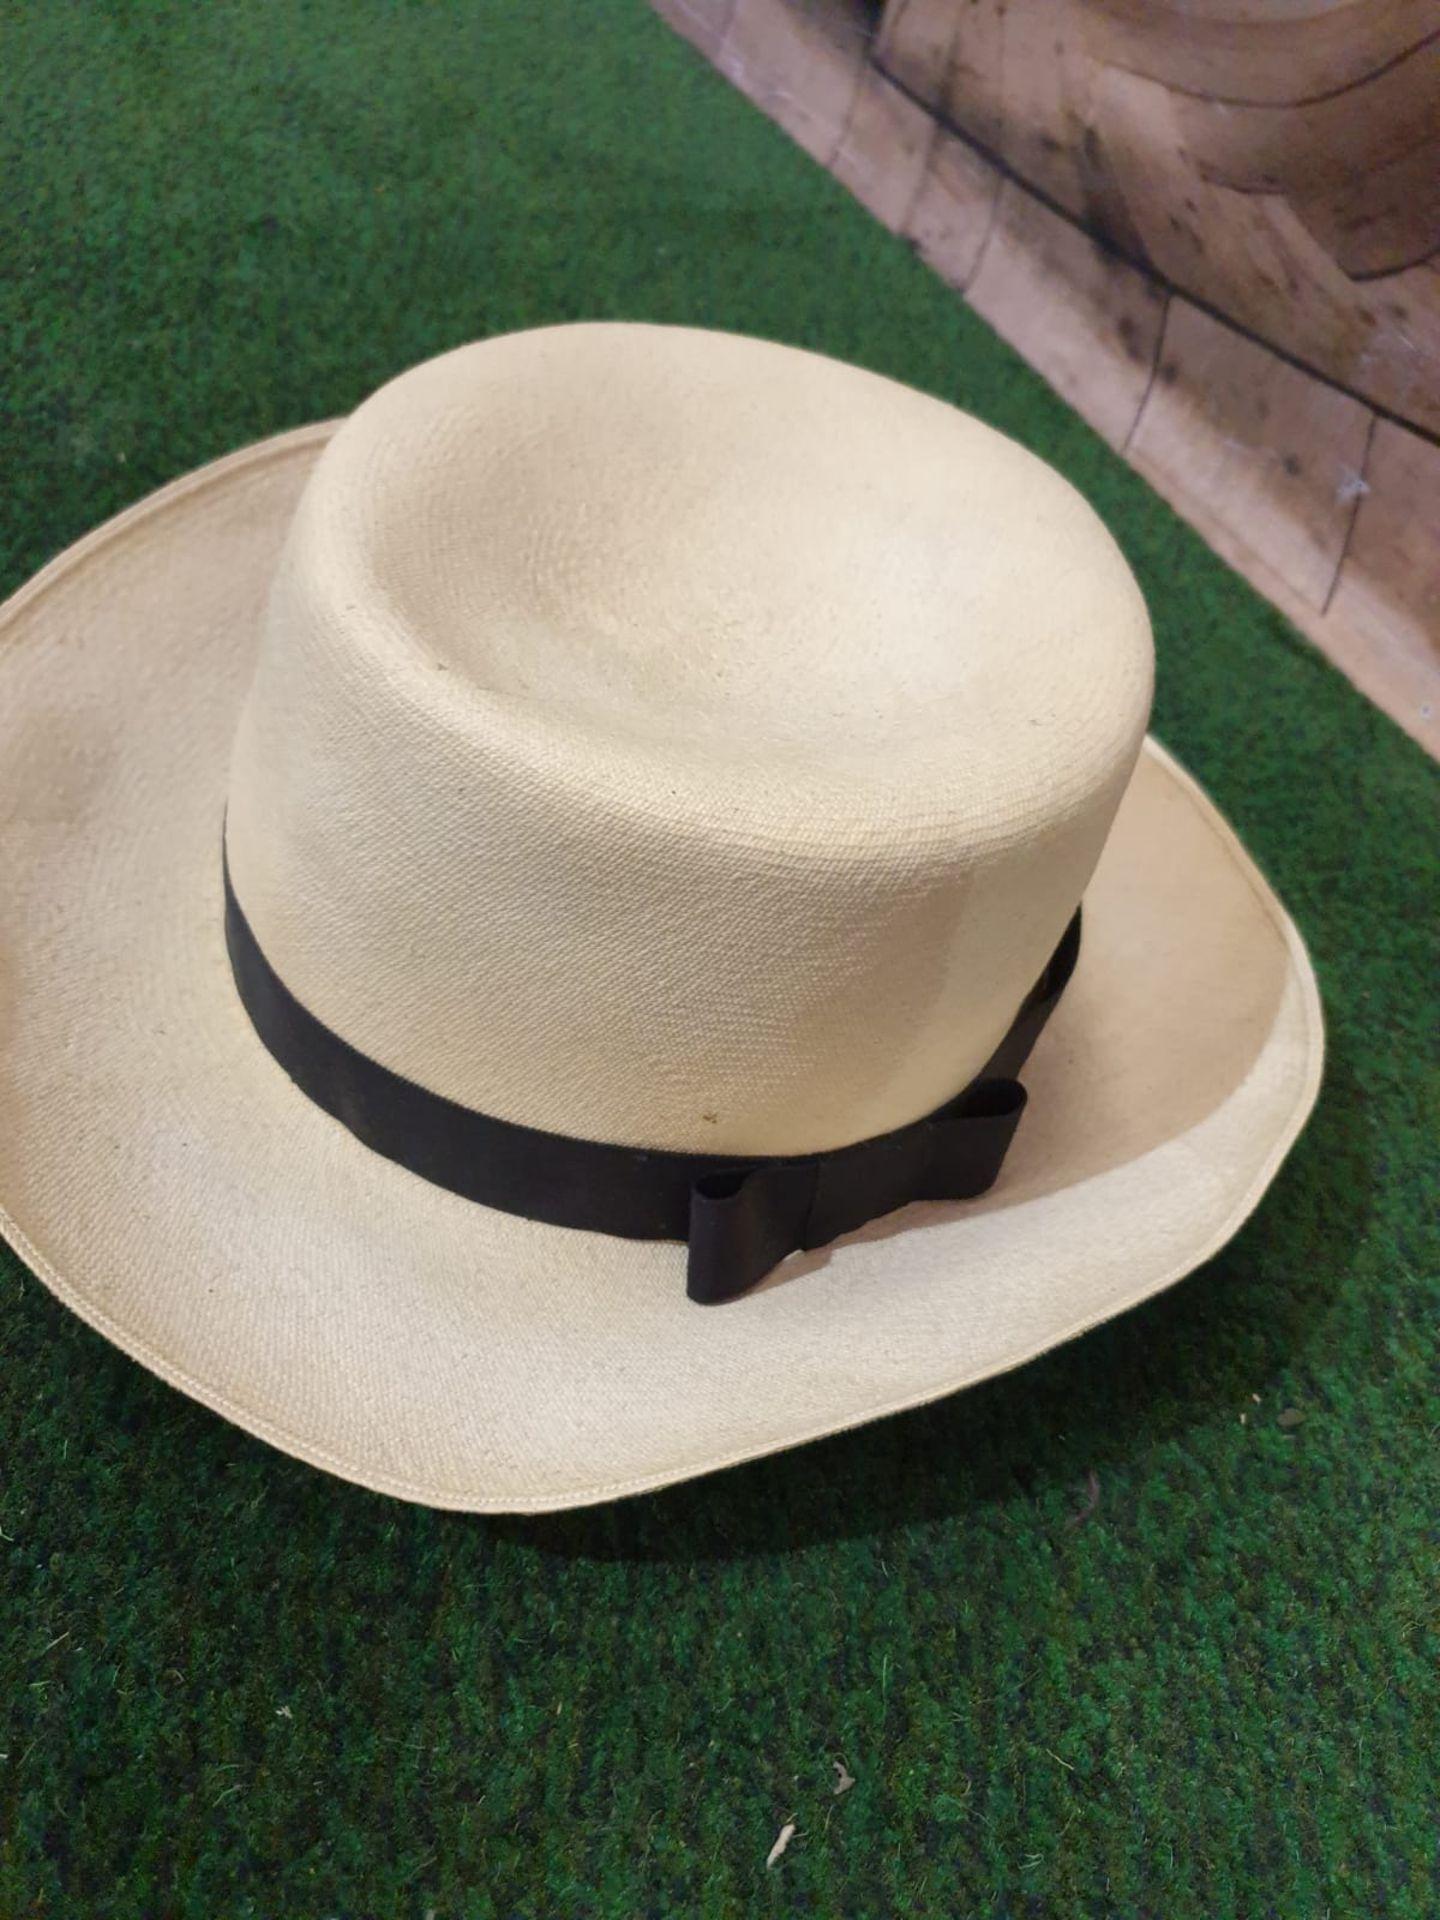 SAVANNAH PANAMA hat by James Lock & co. - Image 2 of 2